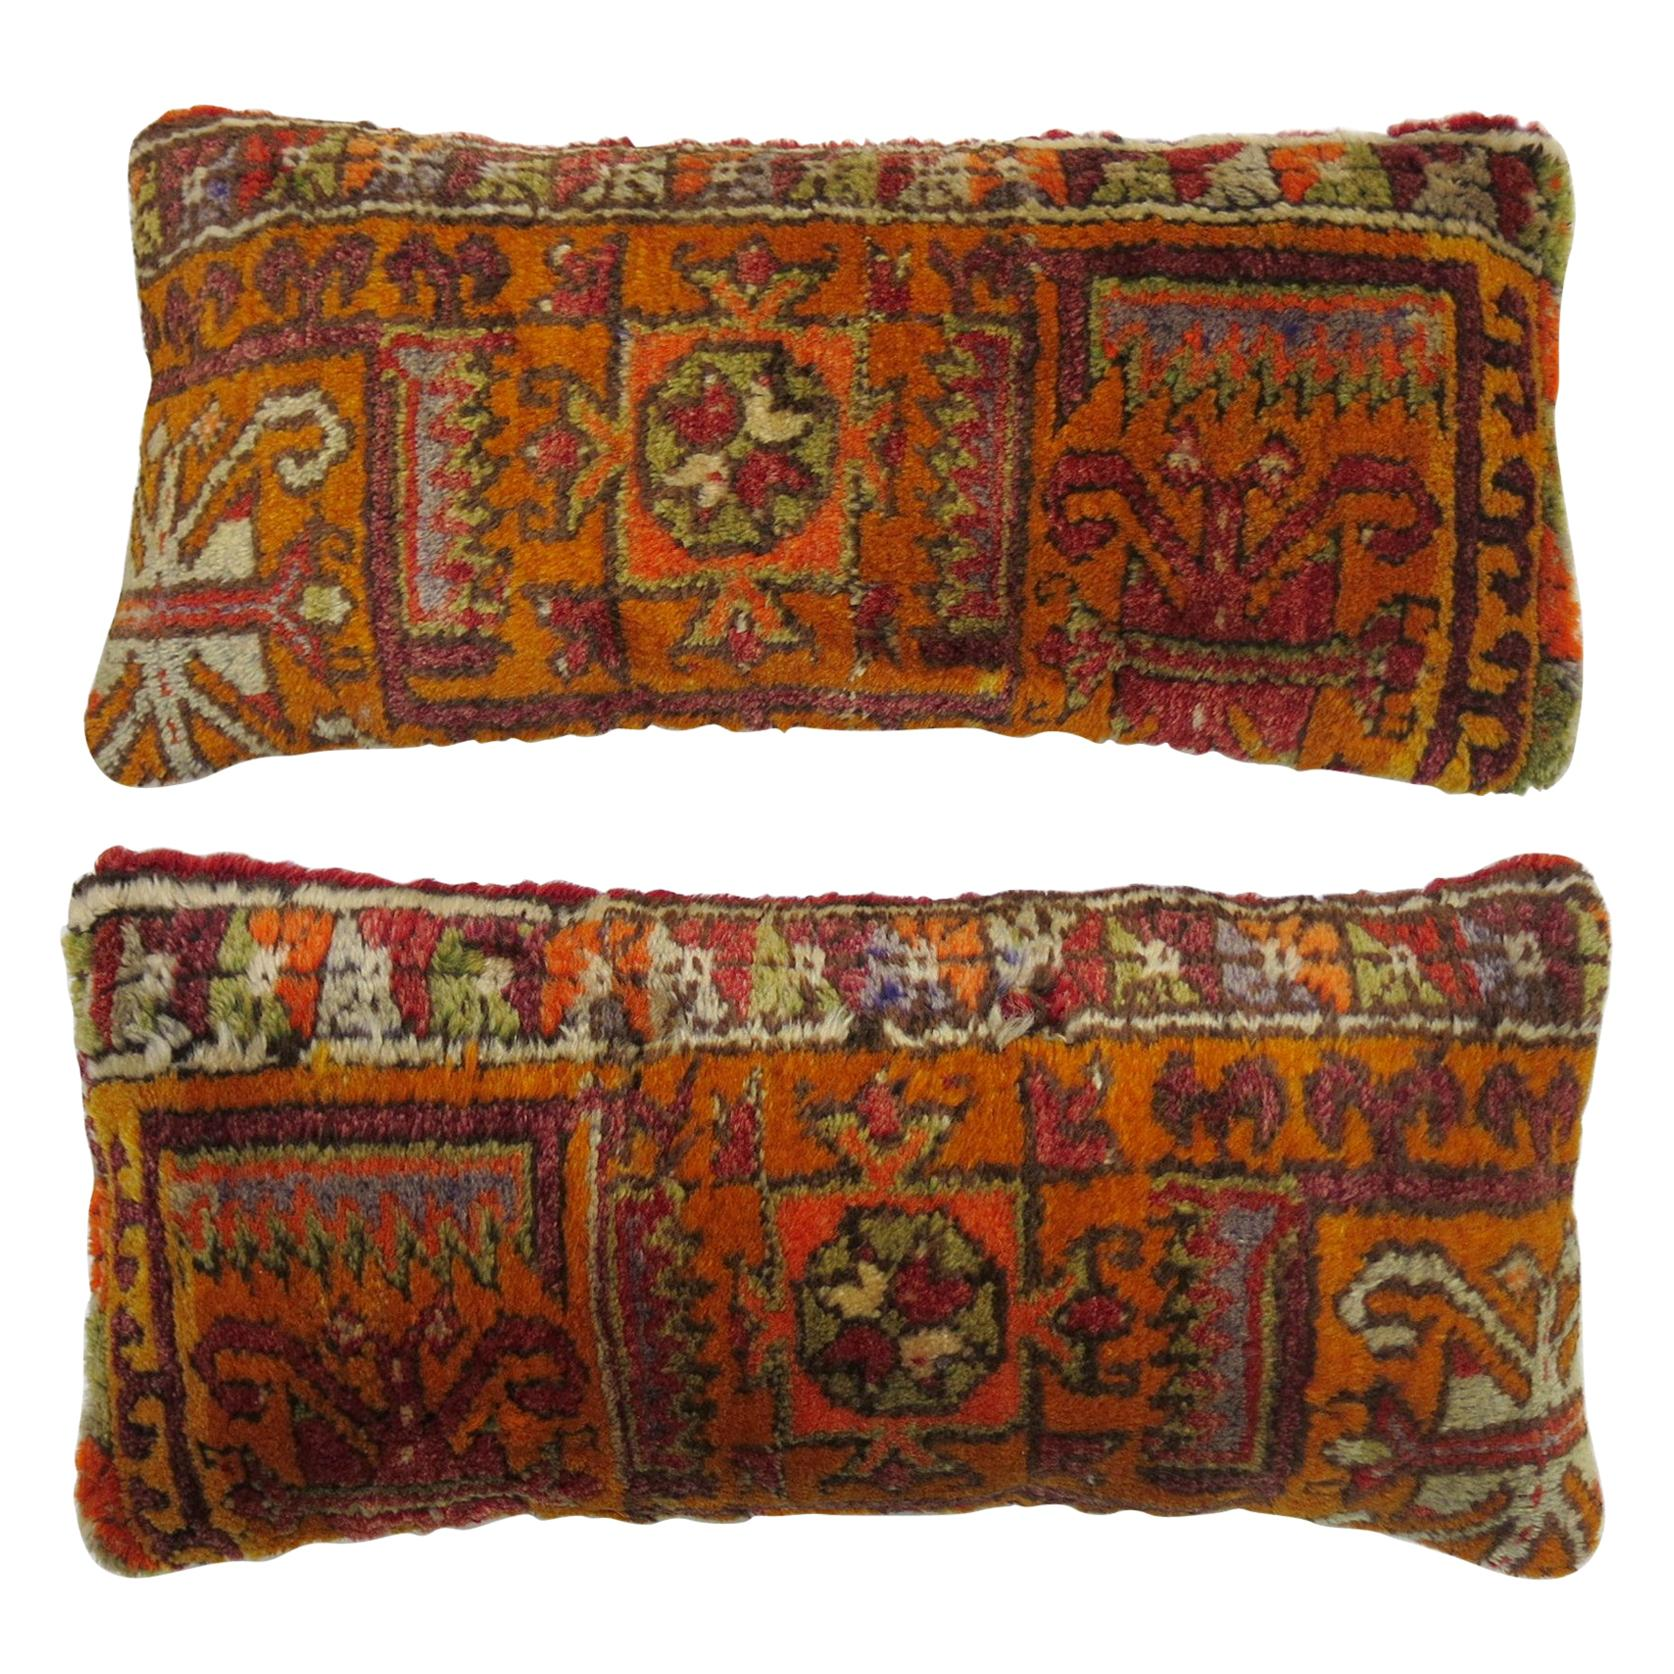 Pair of Bright Orange Bolster Pillows